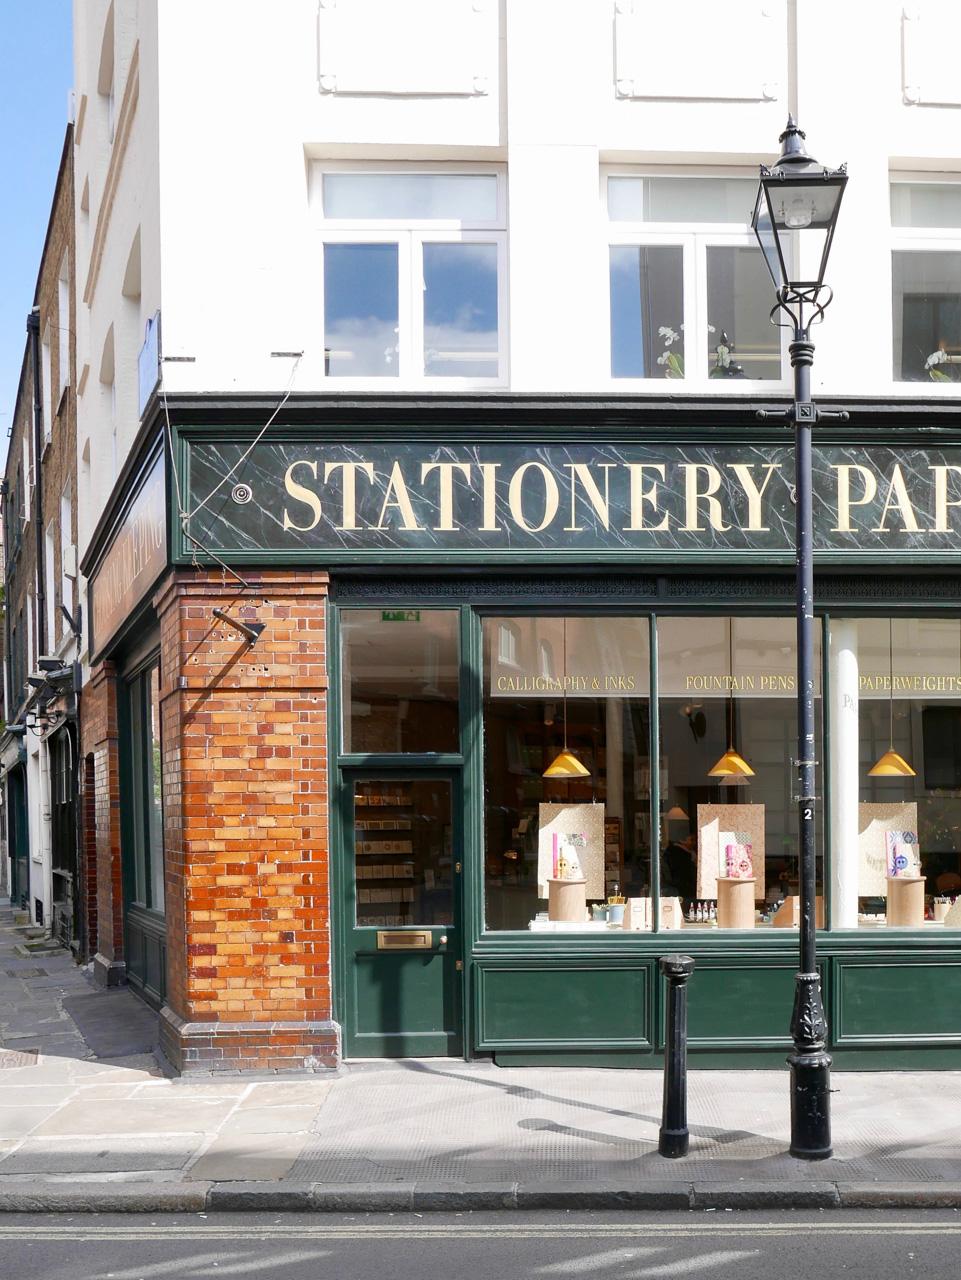 Cara Sharratt Travel - Choosing Keeping - London, England